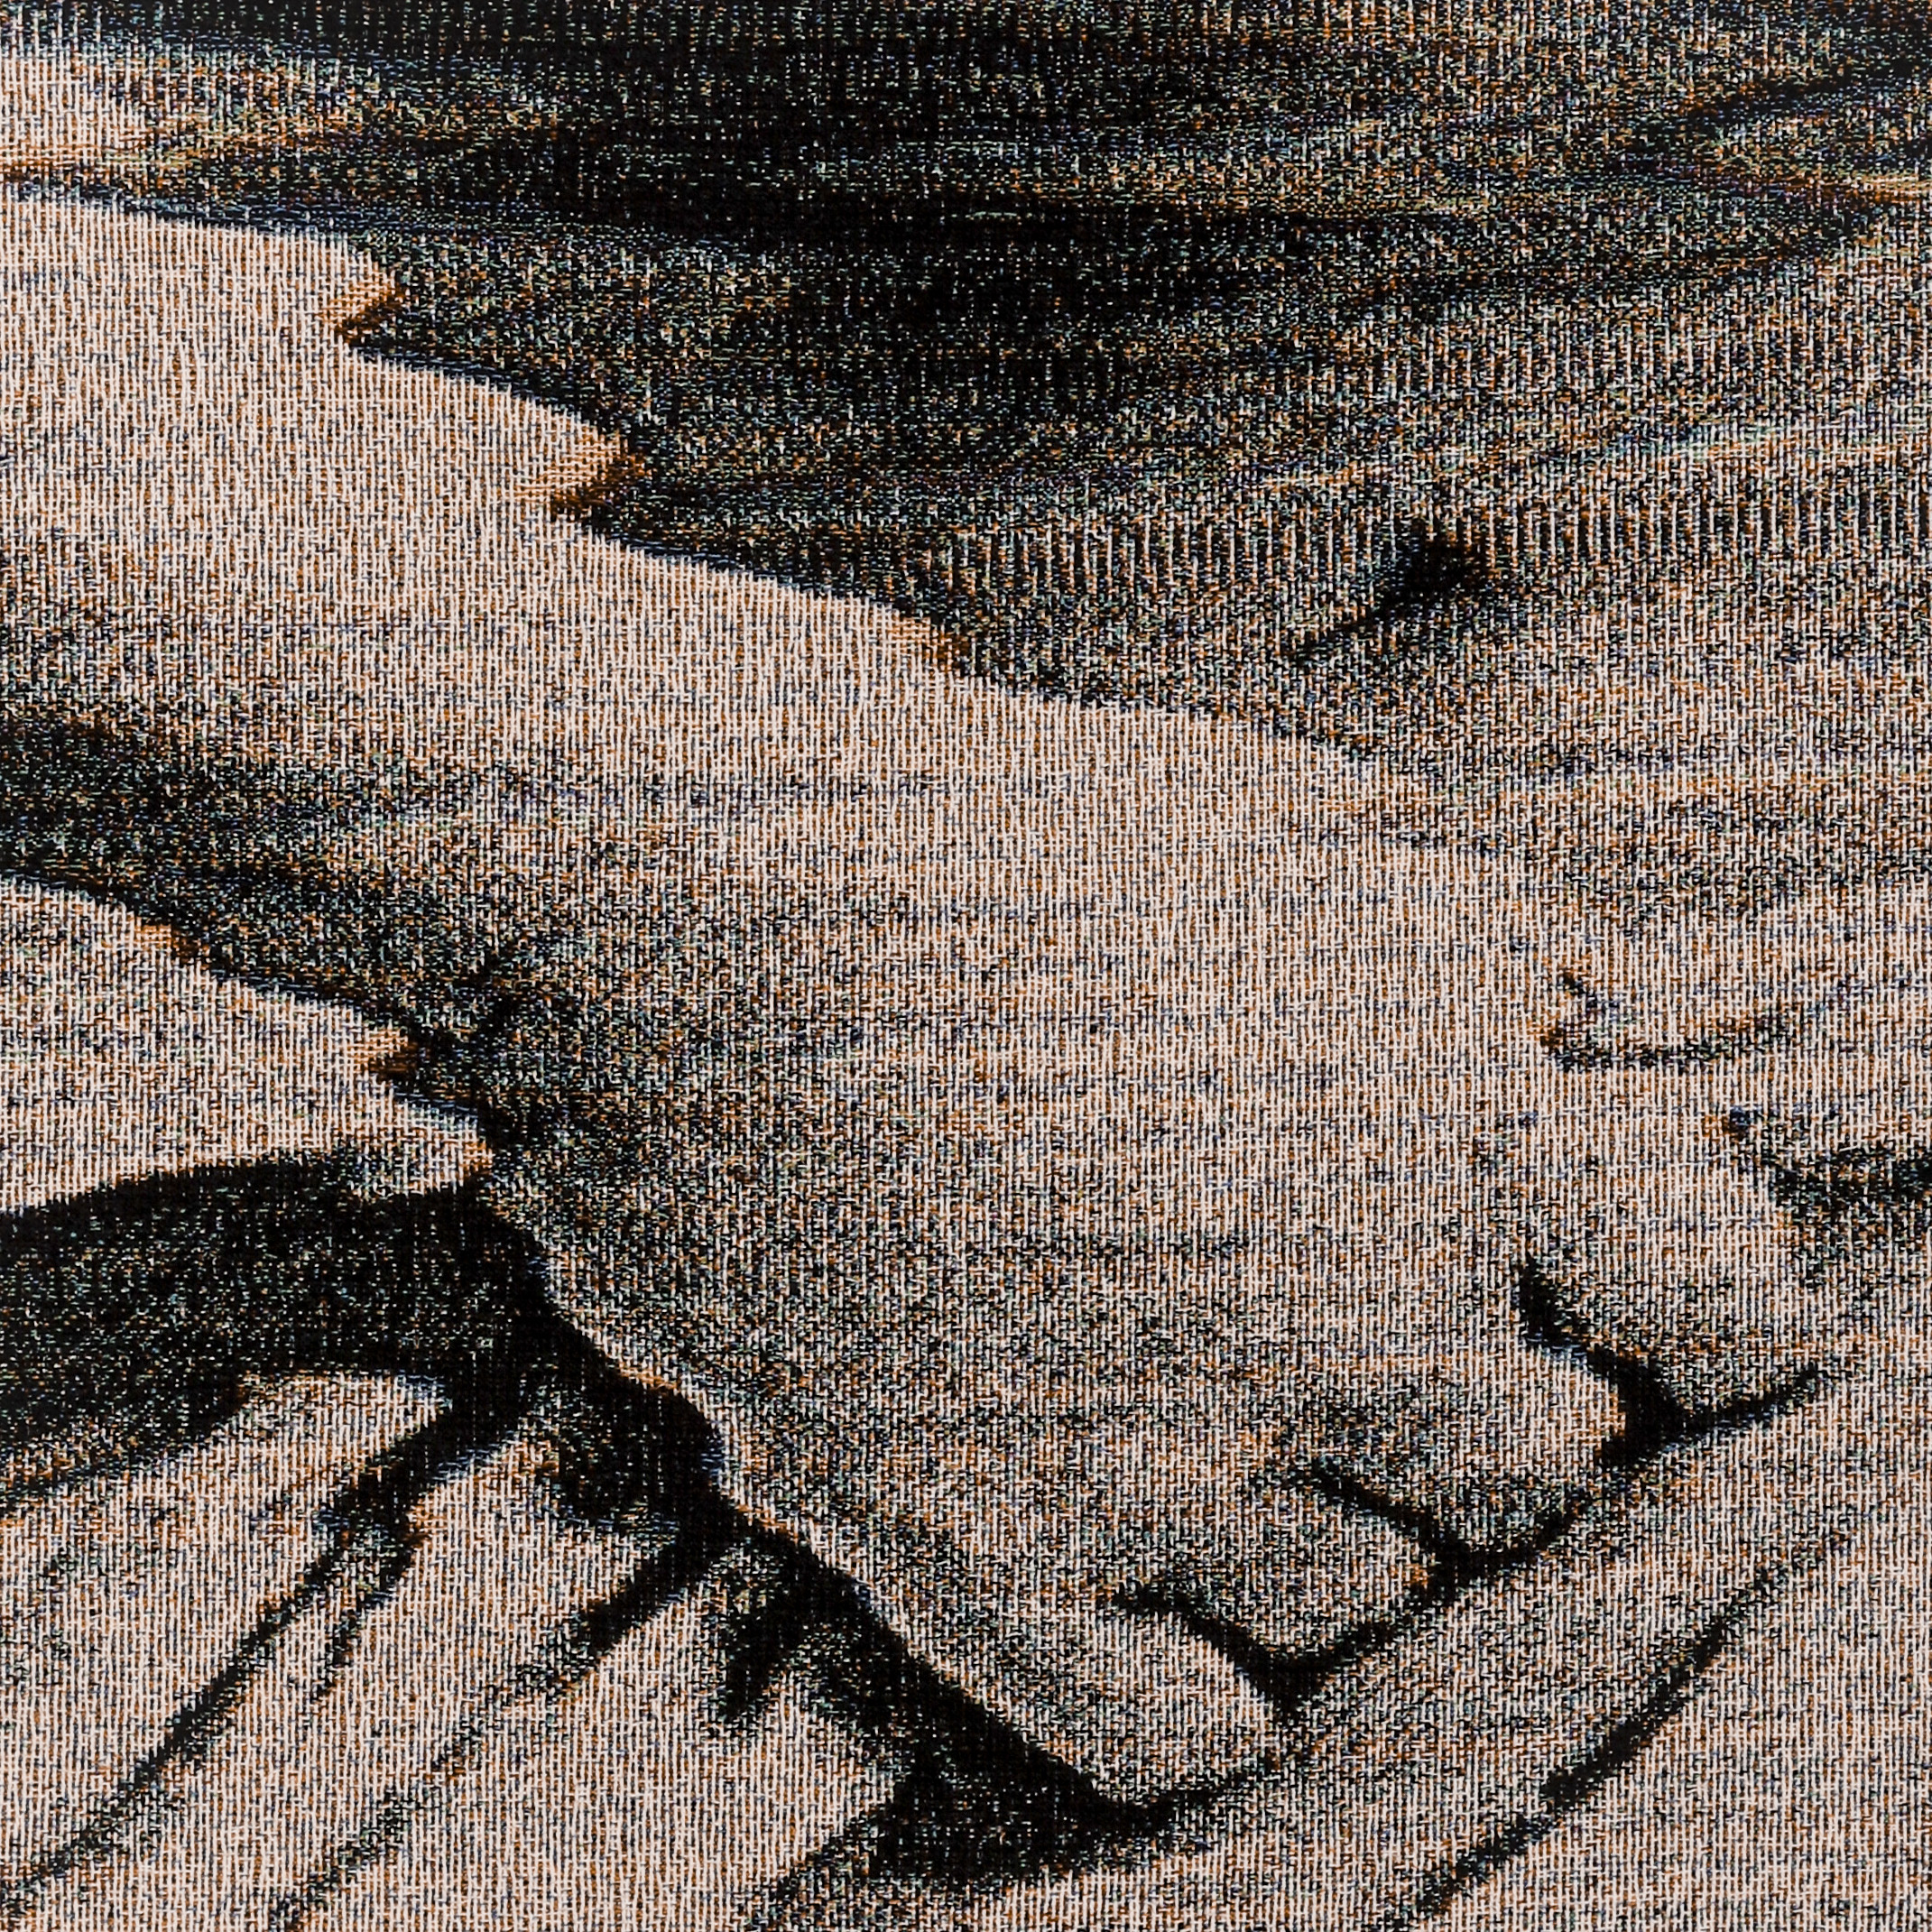 Henrikson_Brett_2019_Textile Detail No.2.jpg